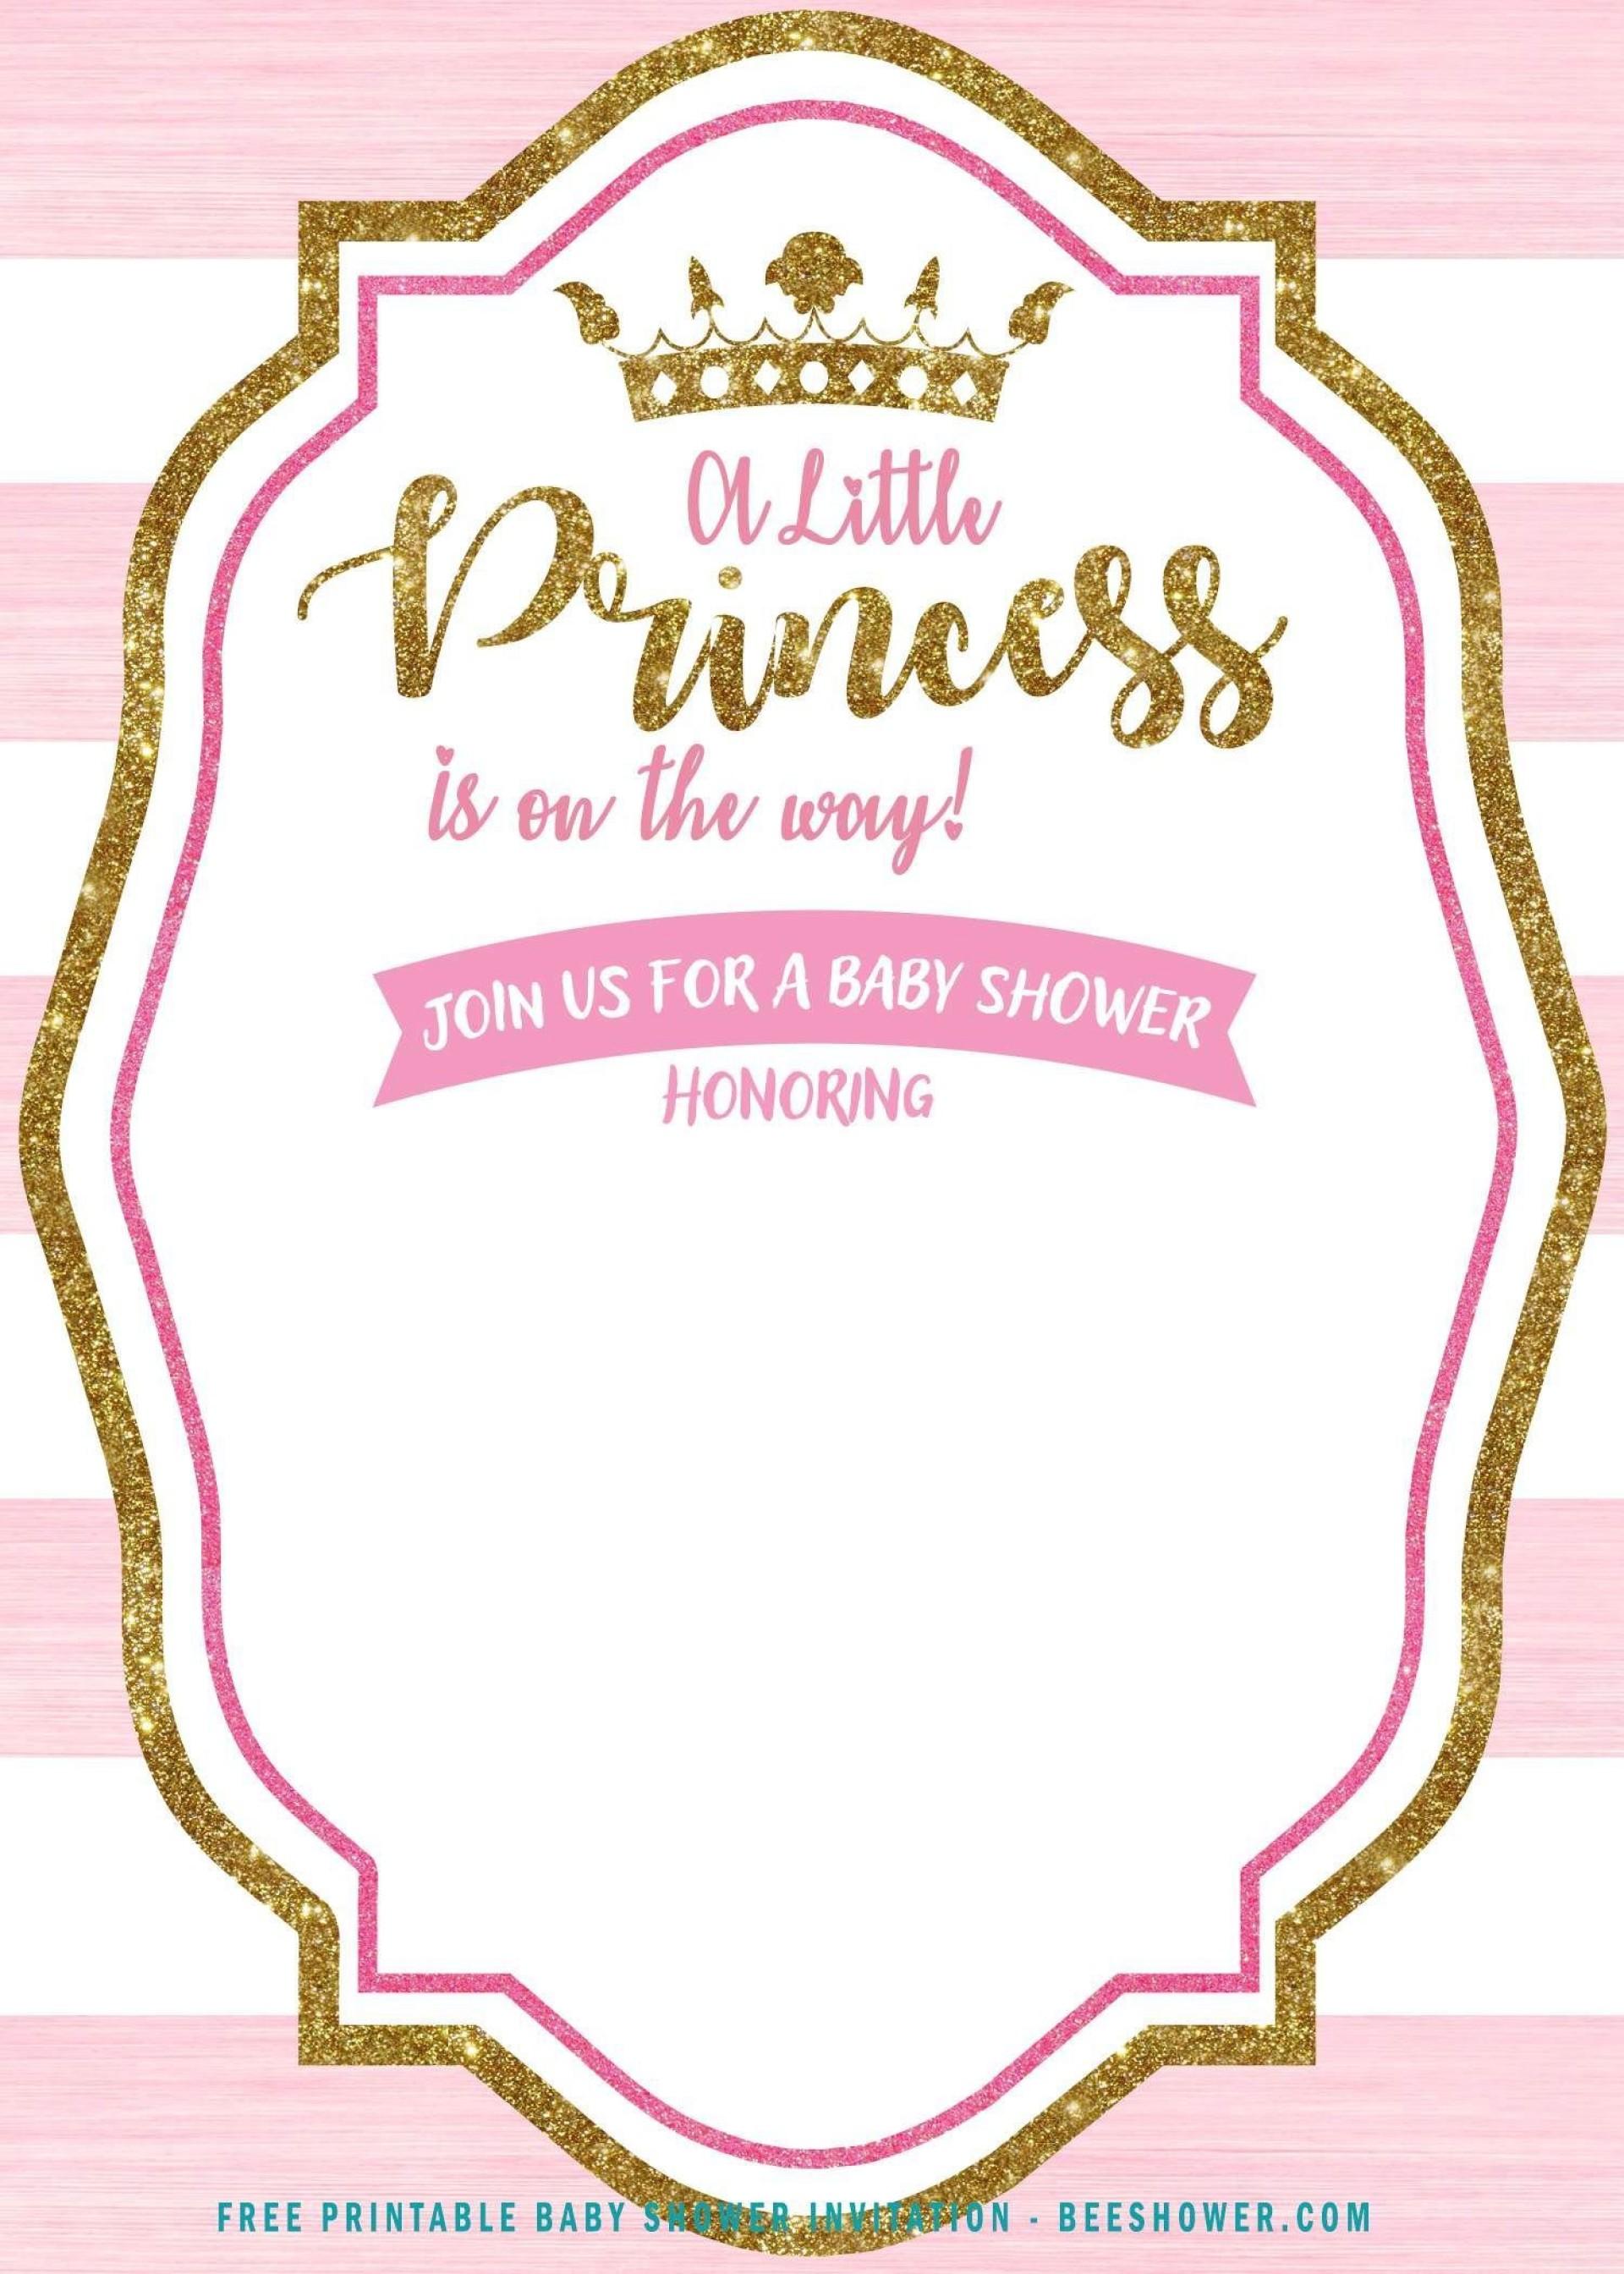 004 Surprising Princes Baby Shower Invitation Template Design  Templates Little Royal Red Disney1920